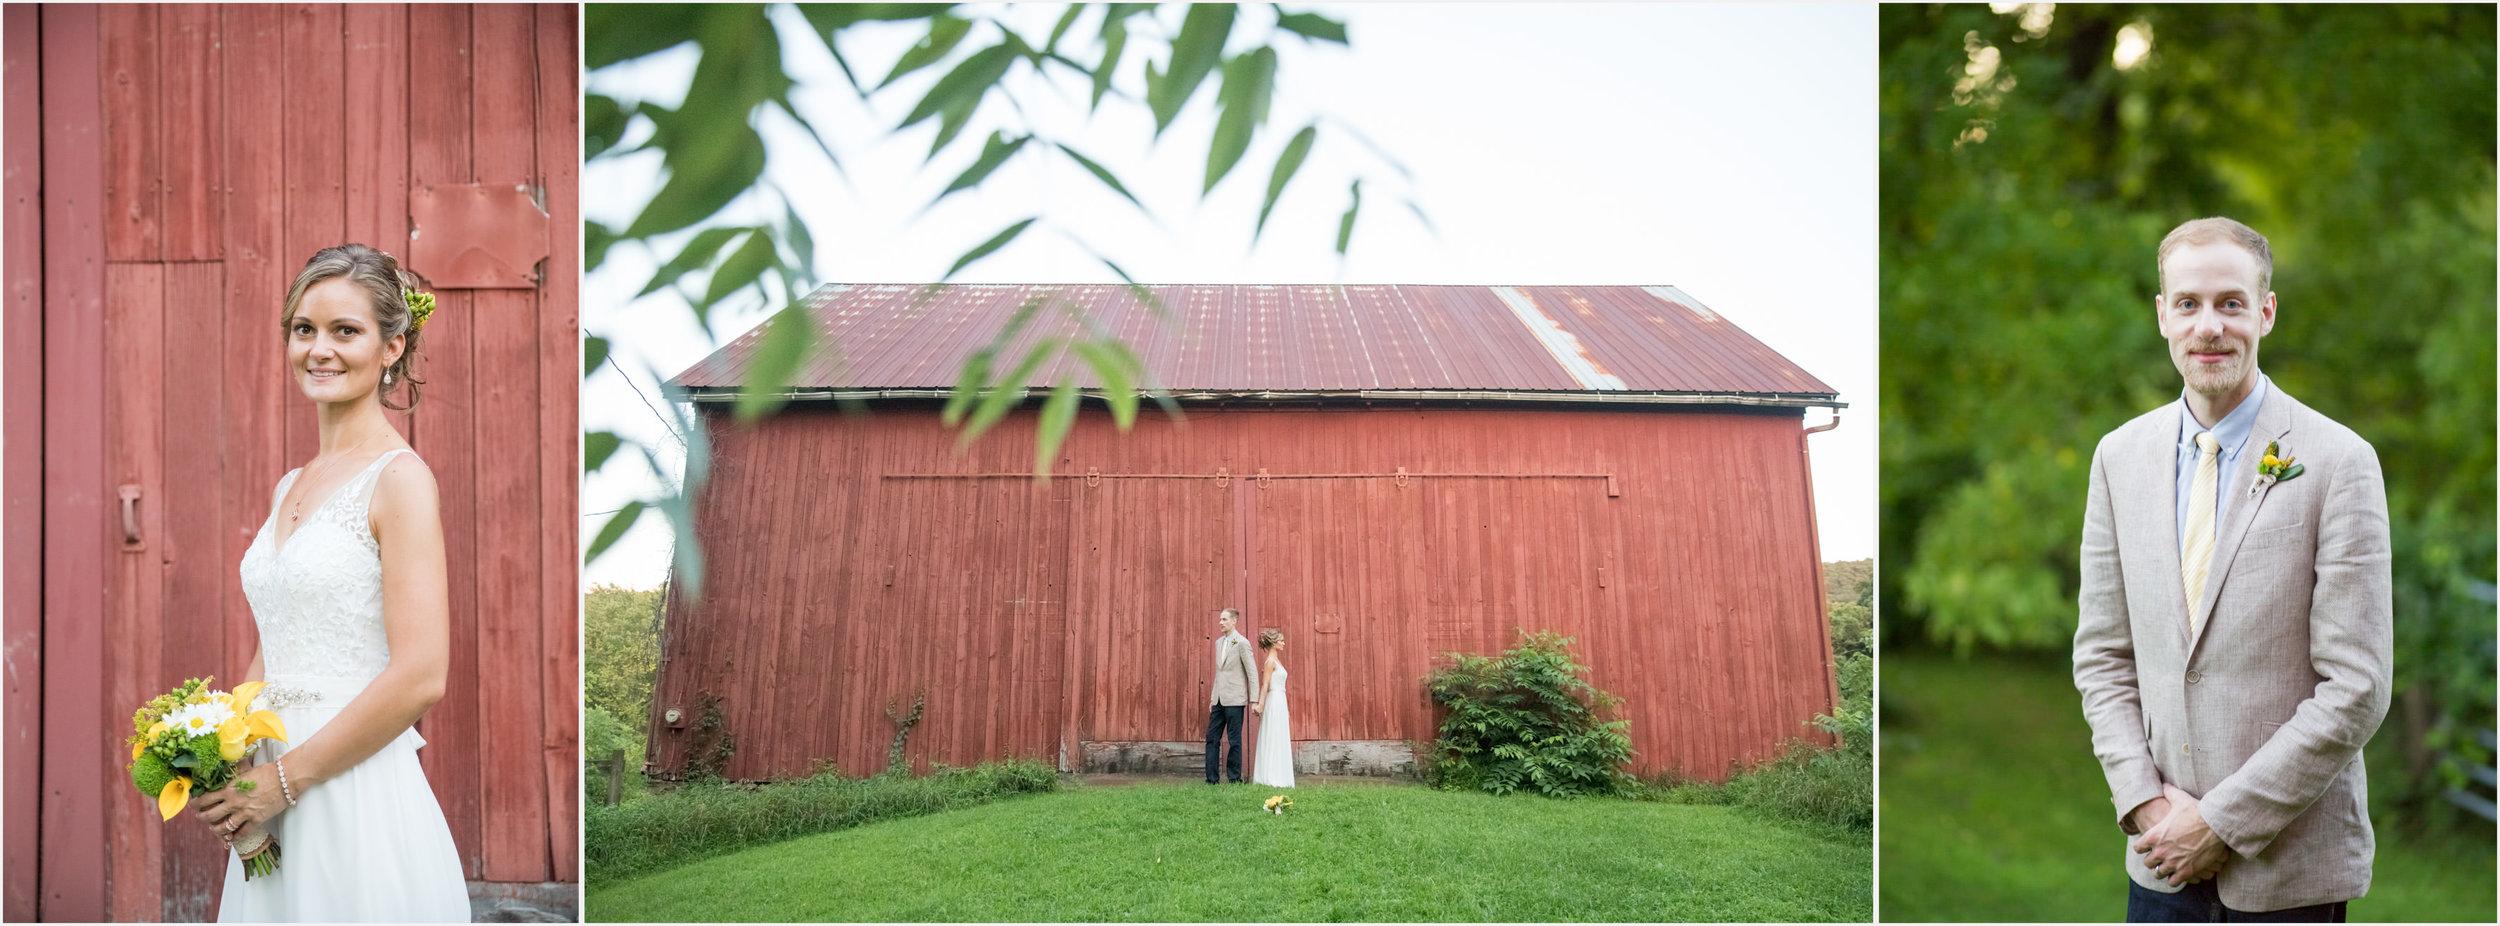 Cassondre Mae Photography Warwick NY Wedding Photographer -26.jpg